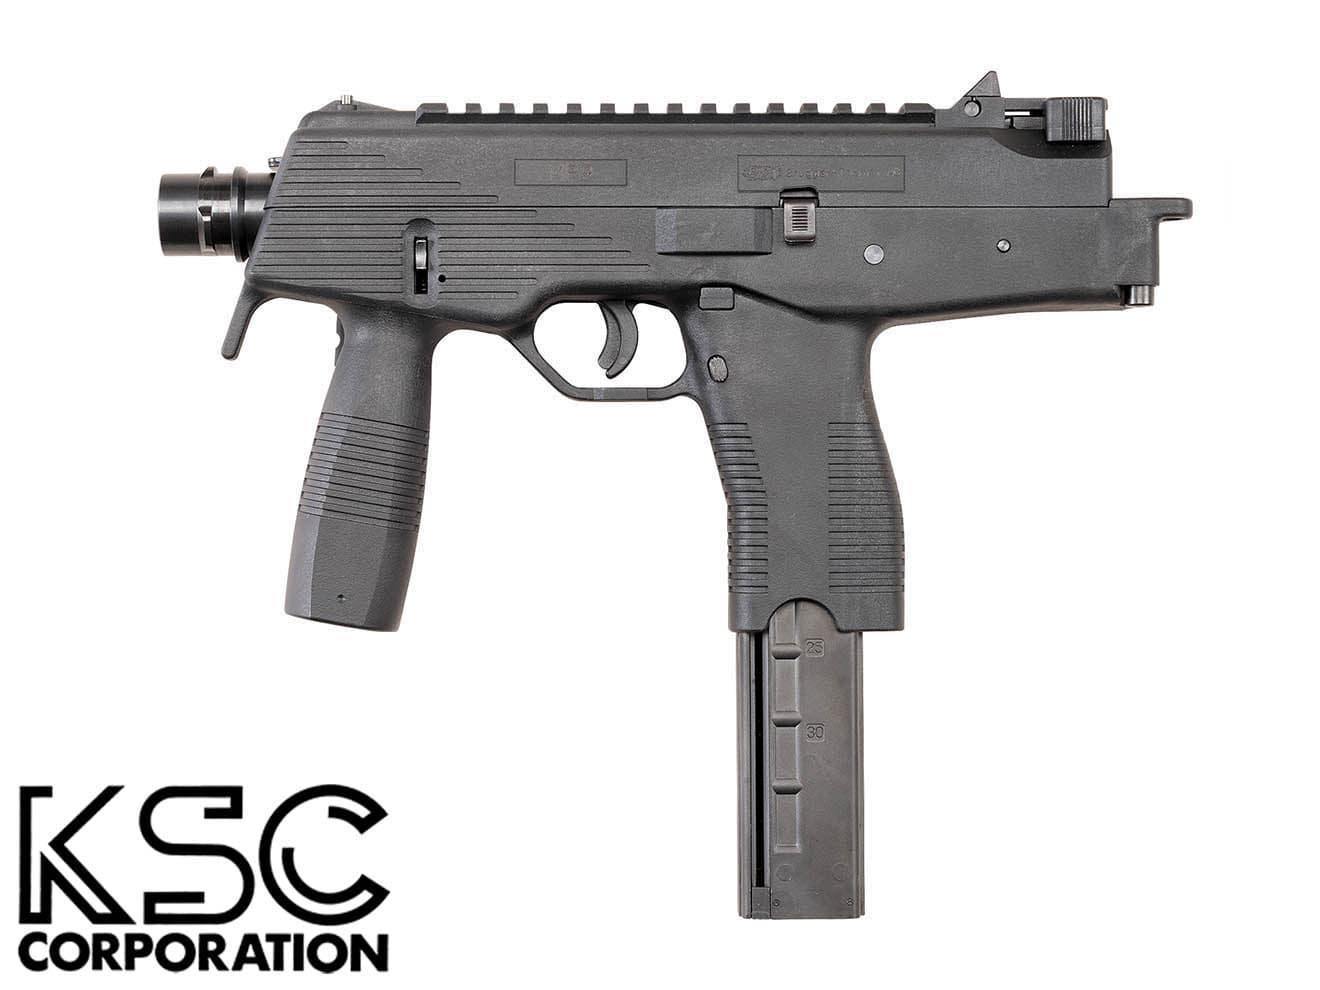 KSC ガスブローバック MP9◆送料無料/ガスブロ/ガスガン/SMG/サブマシンガン/TMP/小型マシンガン/MP-9/日本製